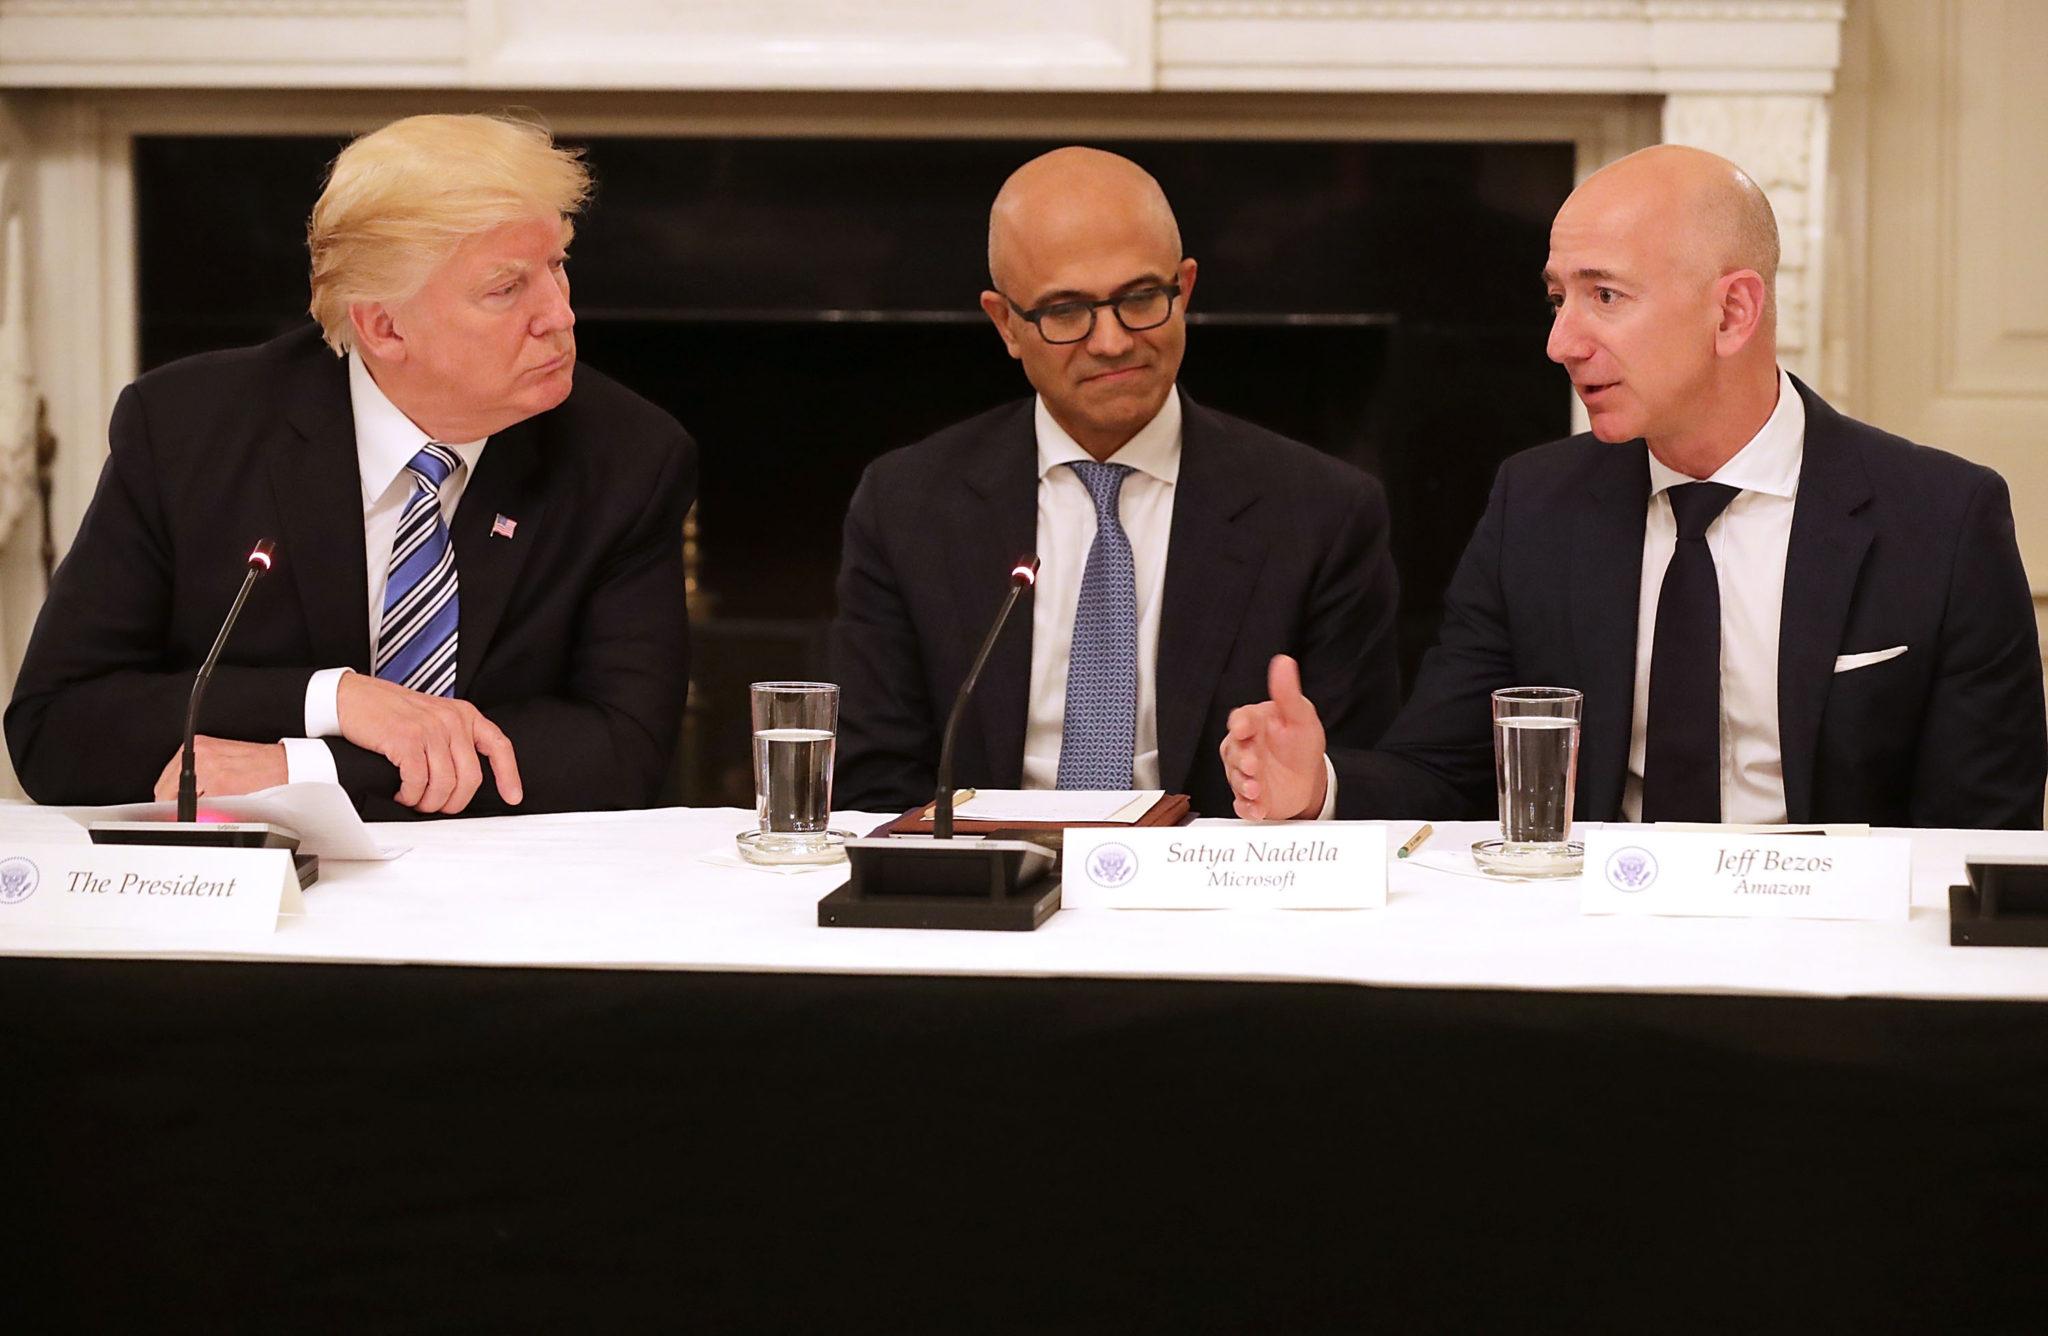 President Trump and Jeff Bezos - Econ Alerts